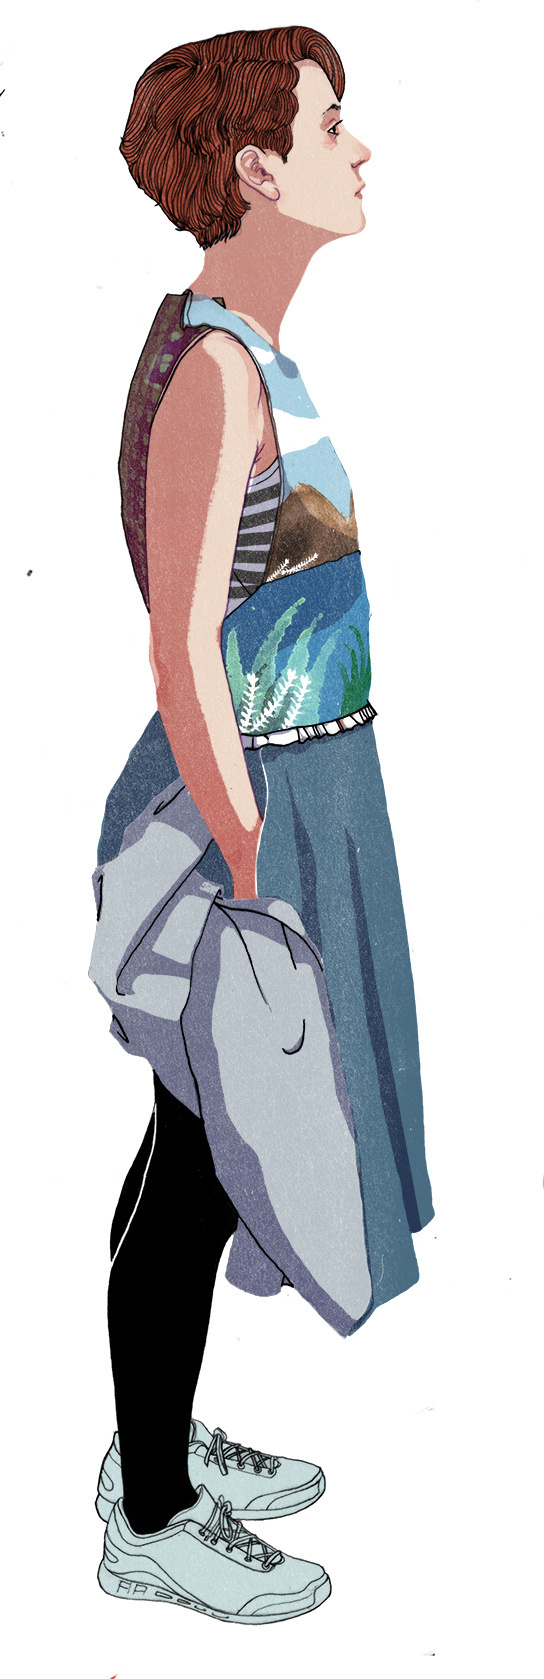 Jorge Roa #cute #illustration #spain #girls